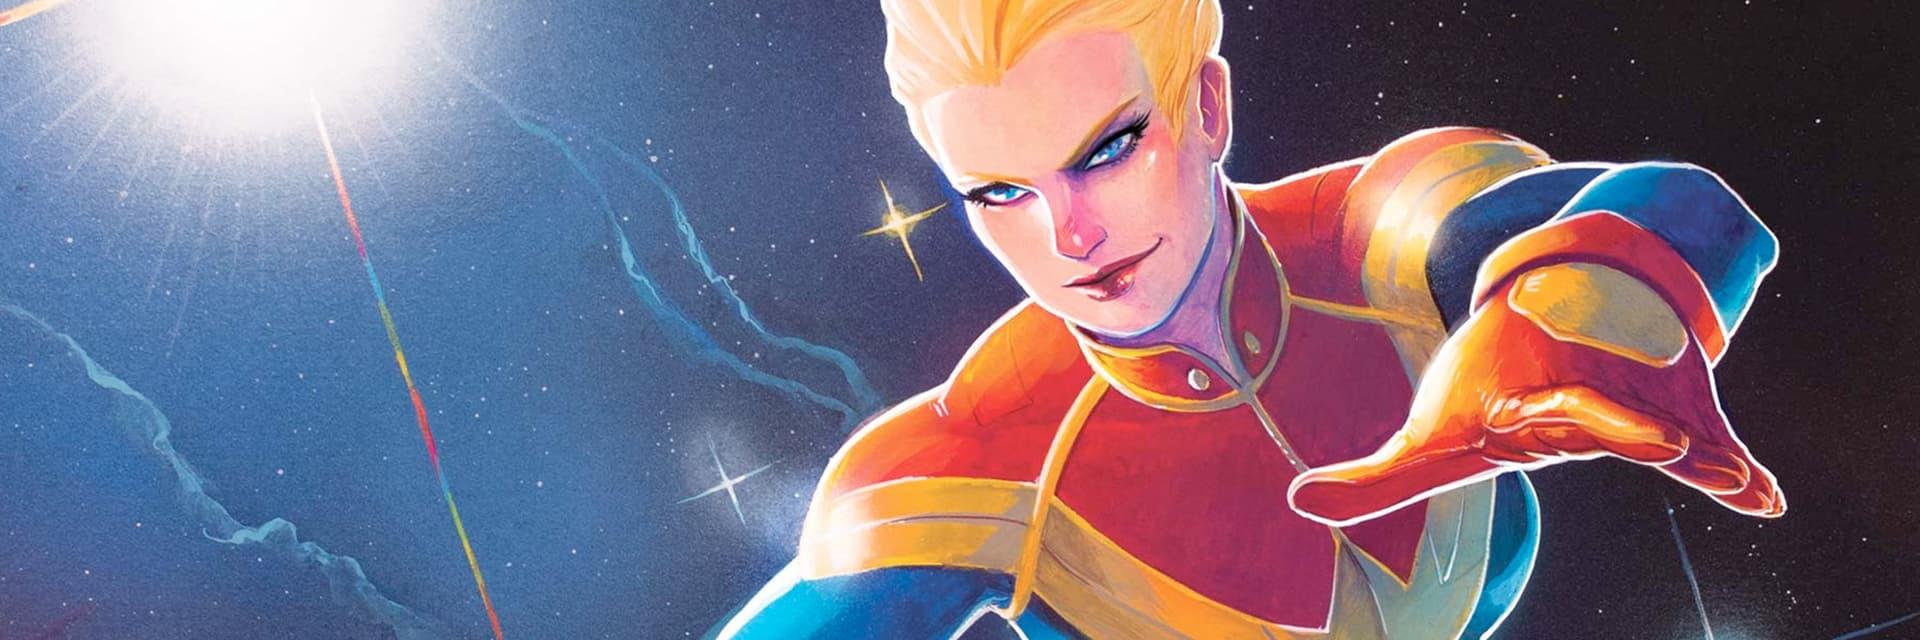 Captain Marvel (Carol Danvers) Powers, Abilities, Villains